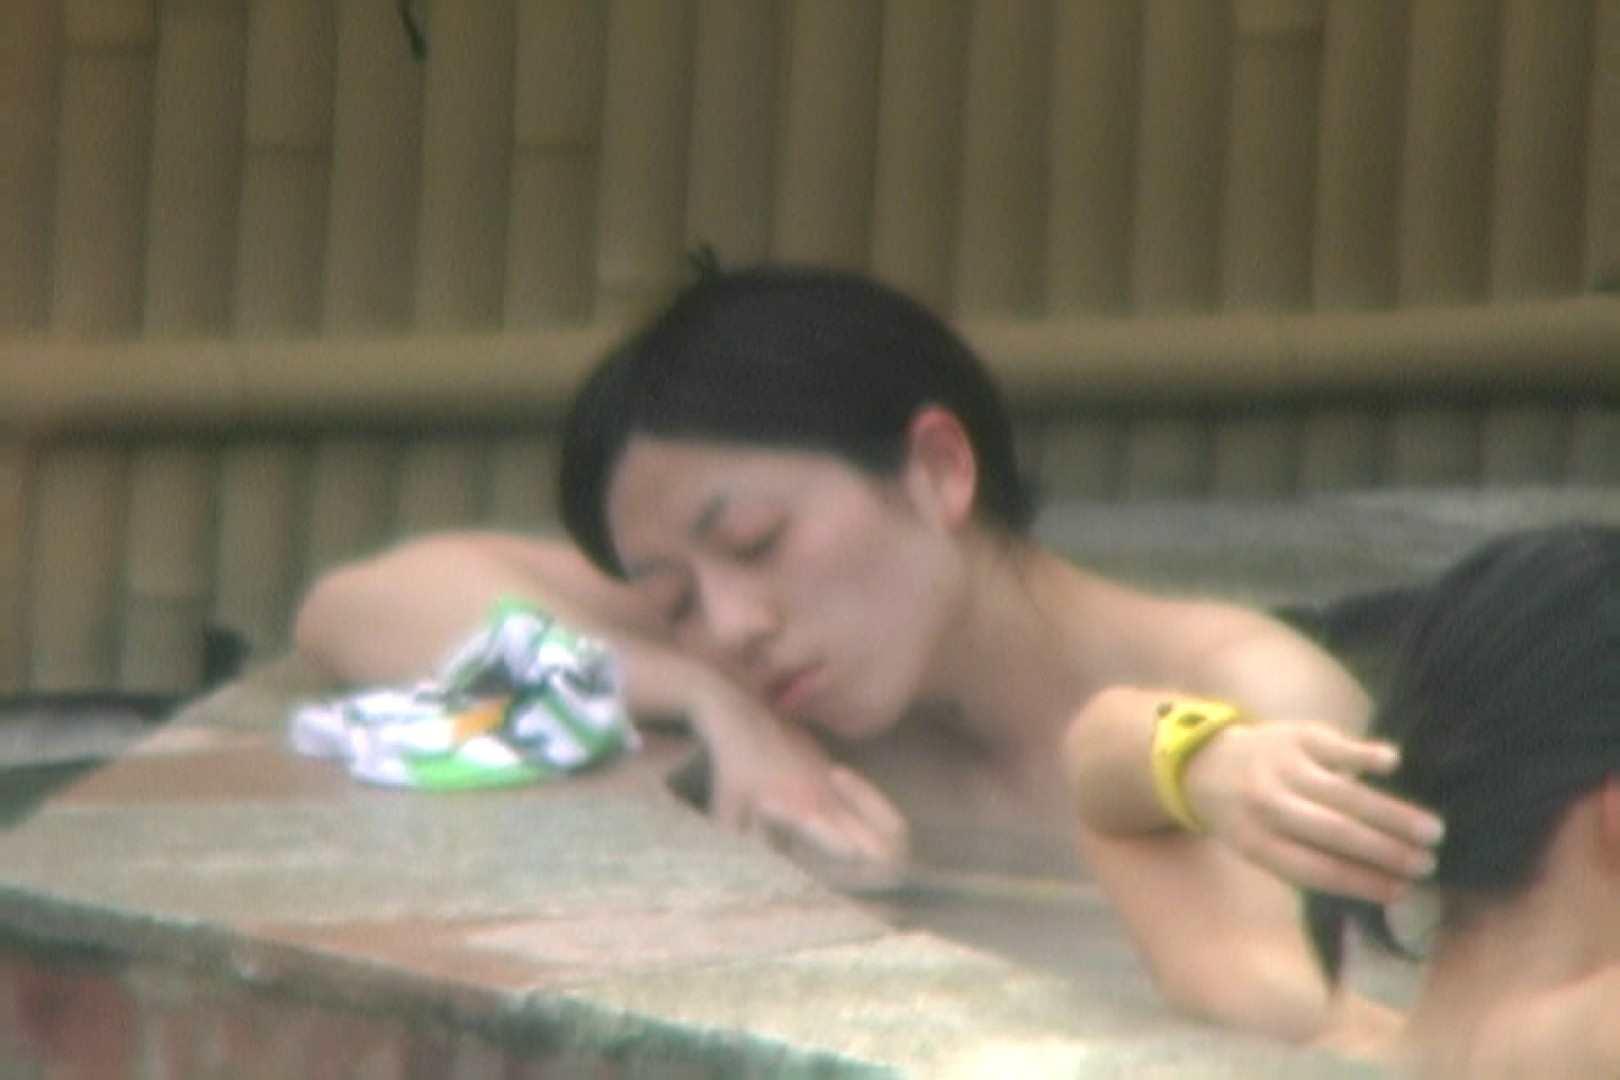 Aquaな露天風呂Vol.562 露天 AV無料動画キャプチャ 109画像 71